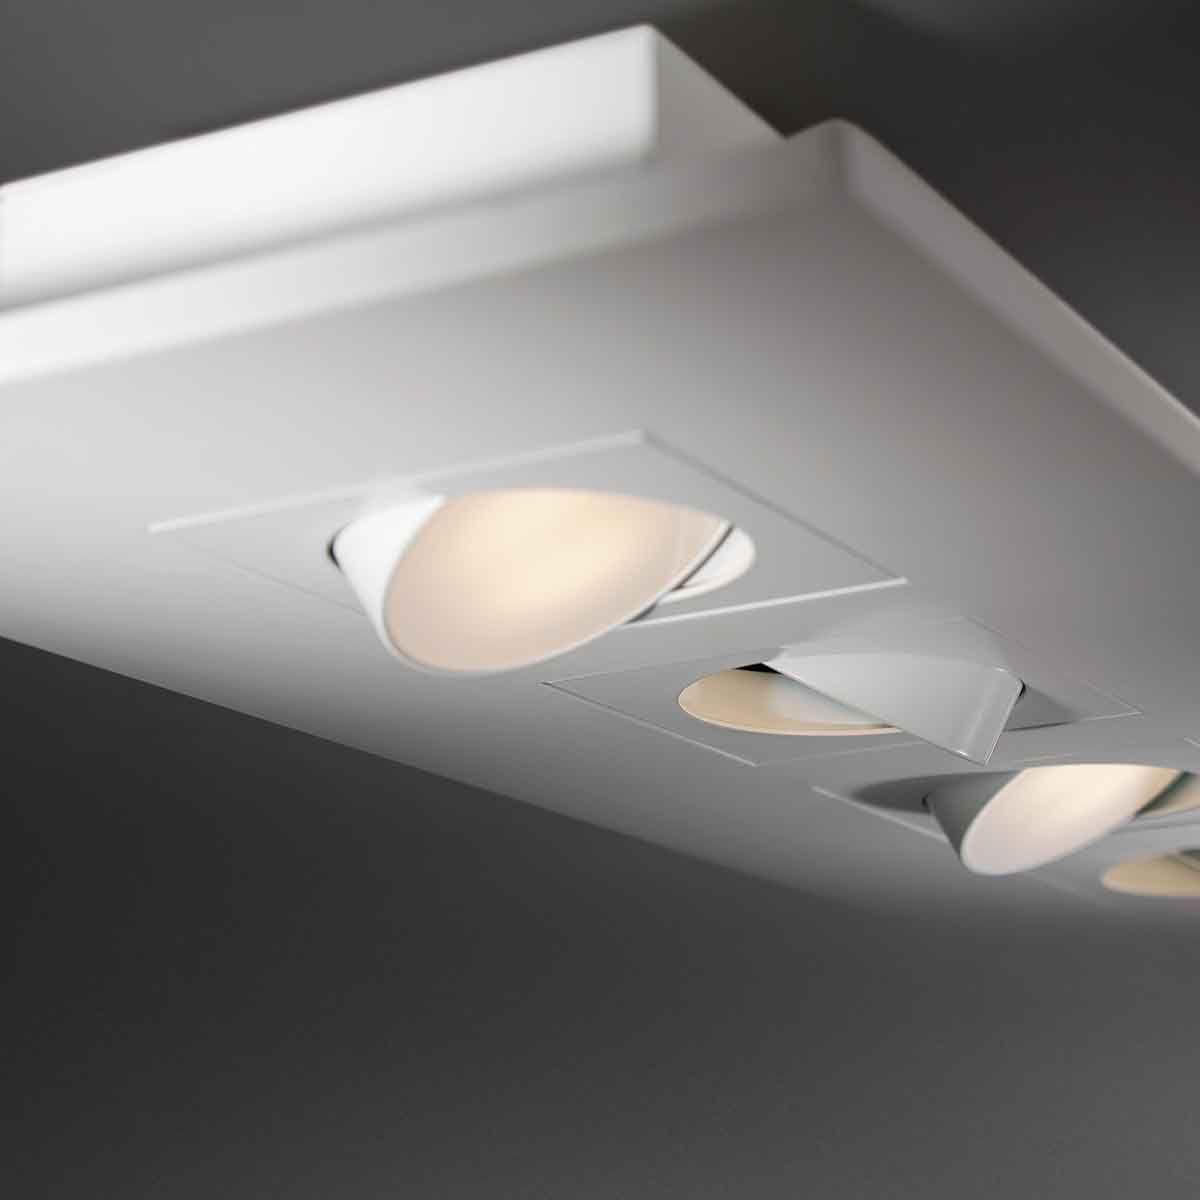 Alcon Lighting 12050 Elegante Architectural Led Surface Mount Adjustable Downlight Multiple Fixture